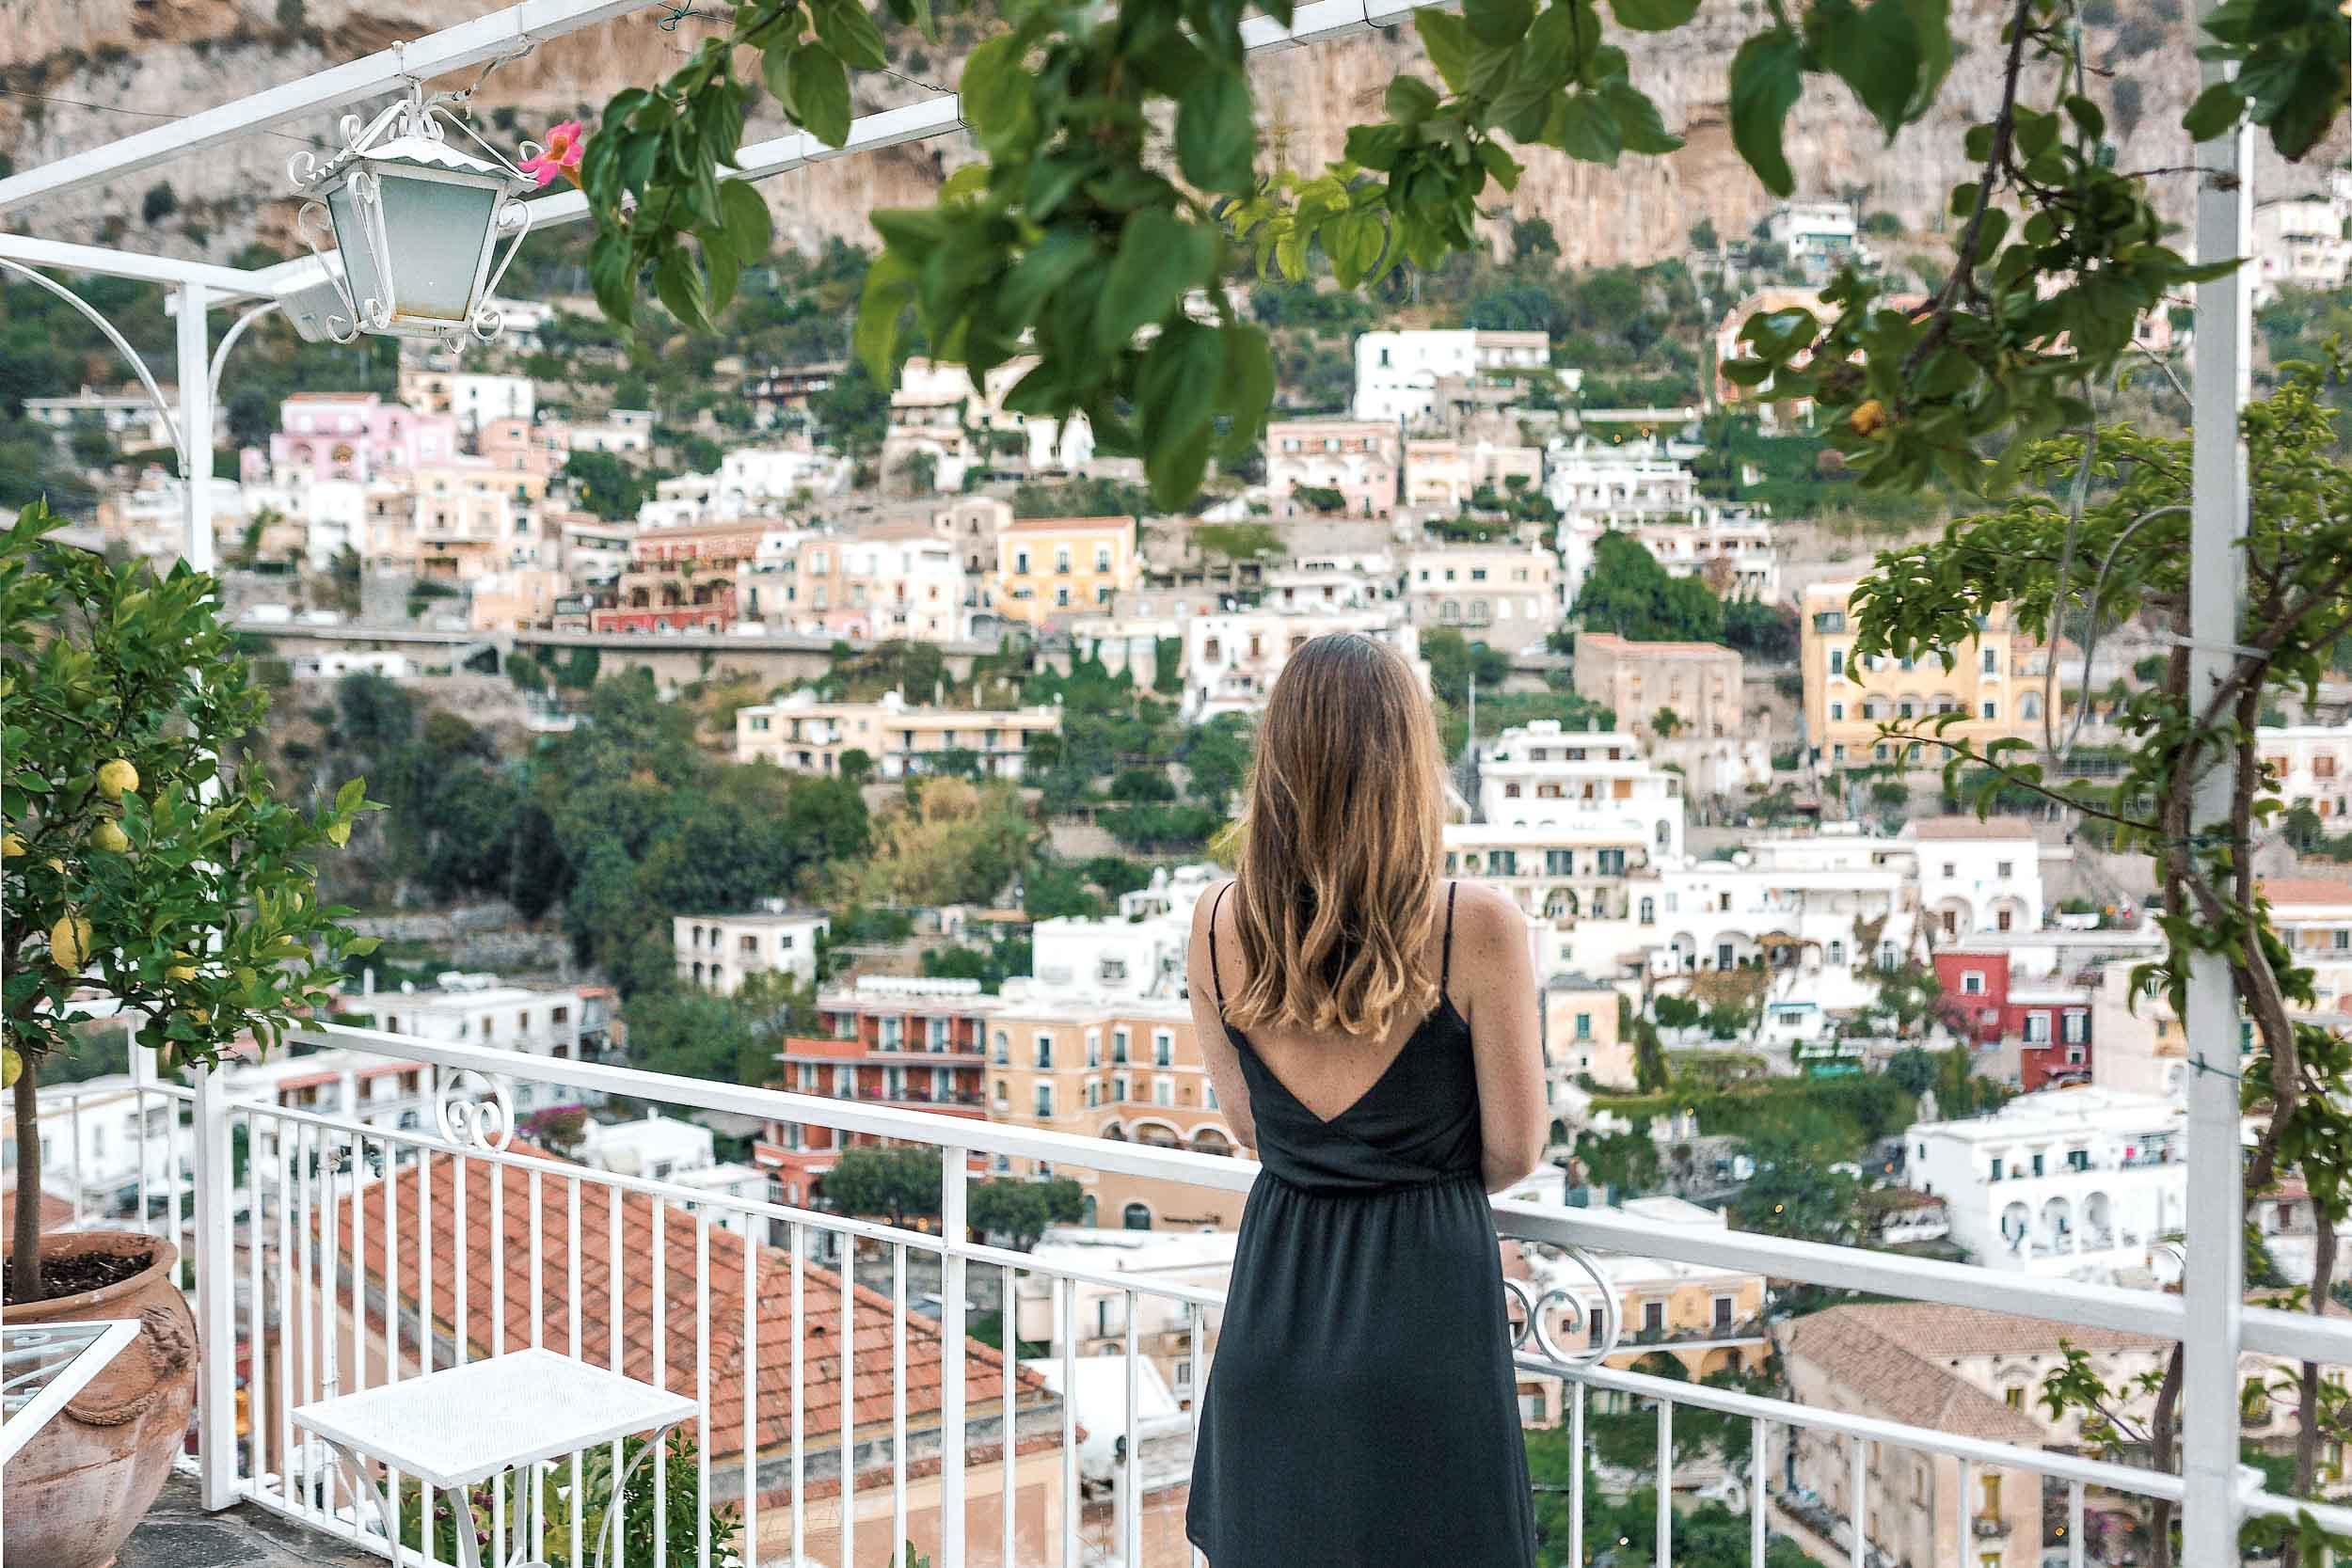 Amalfi Coast best views are from the terrace at Hotel Poseidon